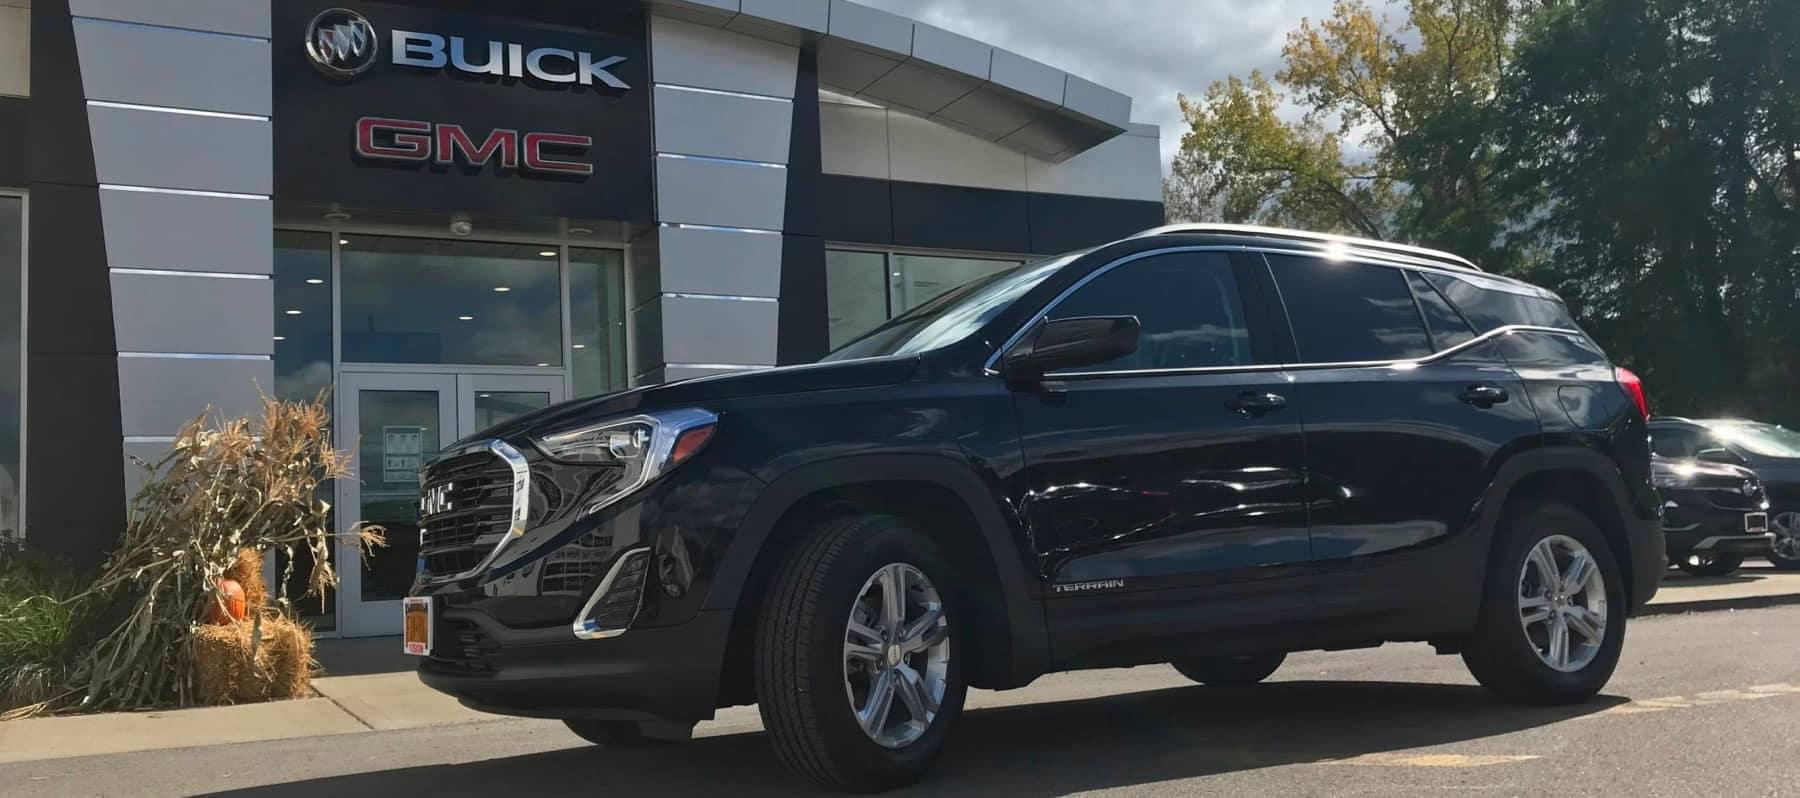 Vision Buick GMC Dealership Exterior